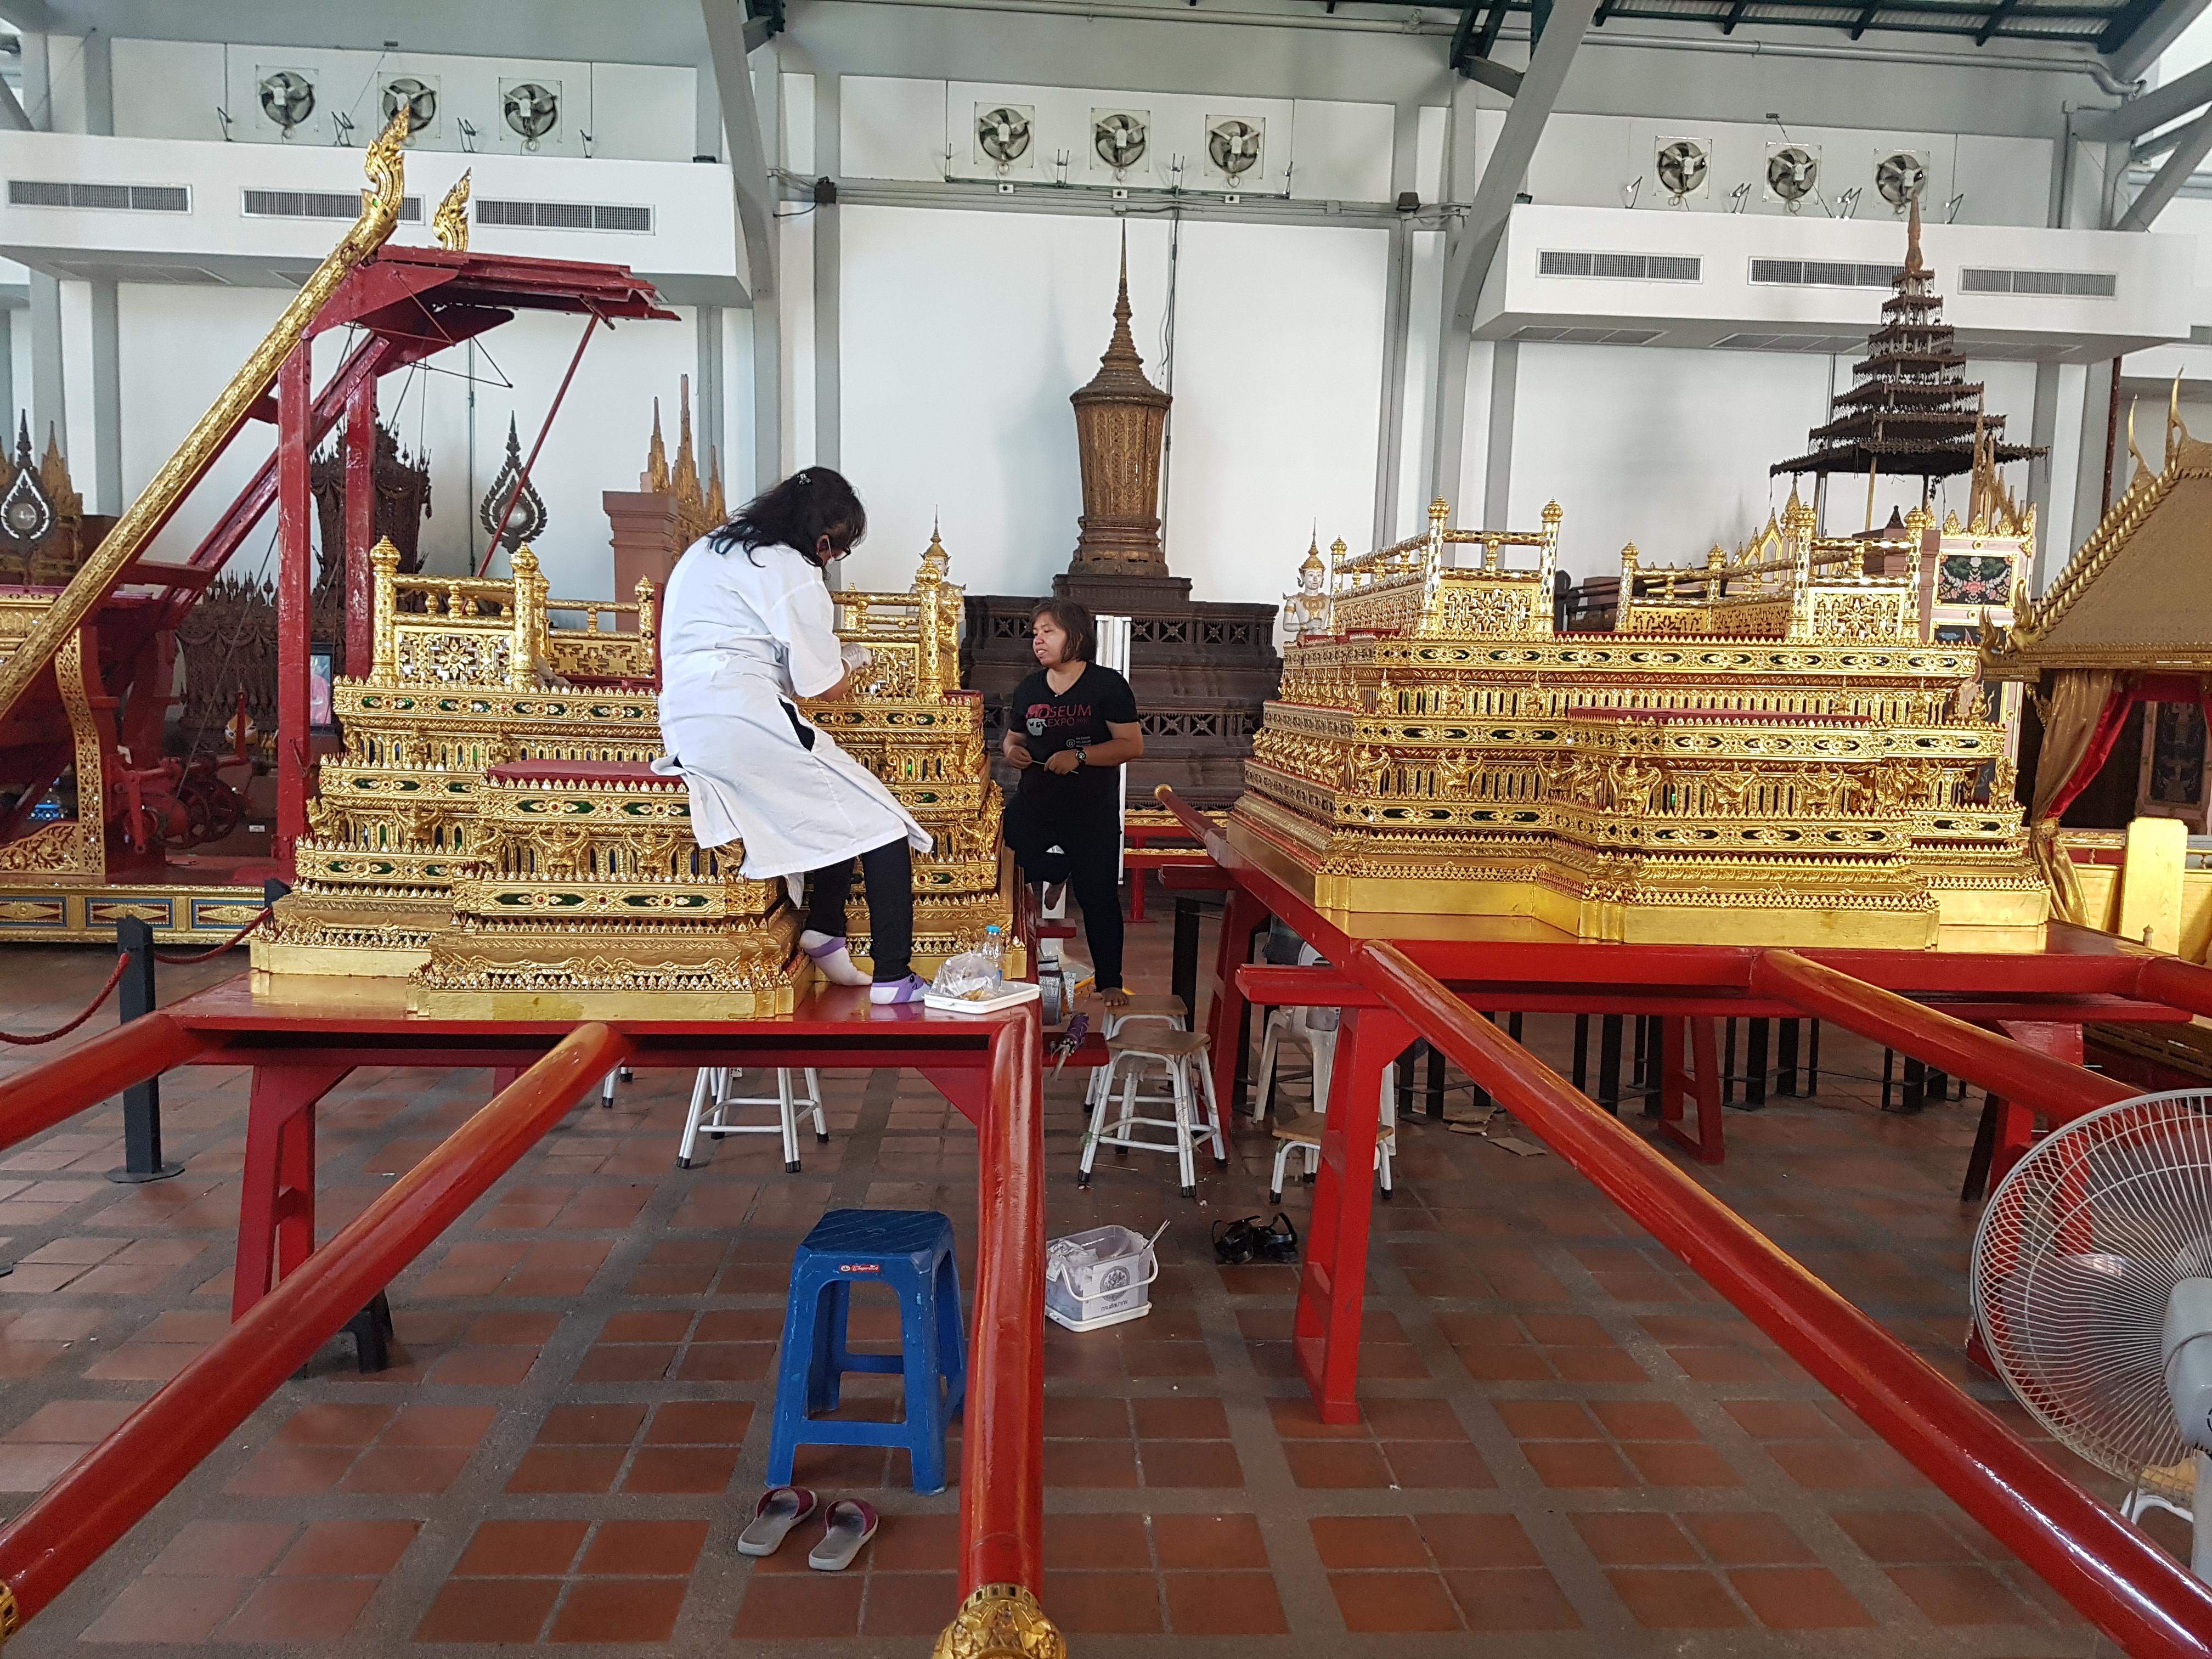 Preparing Phra Yanna Mat Sam Lam Khan (พระยานมาศสามลำคาน, literally